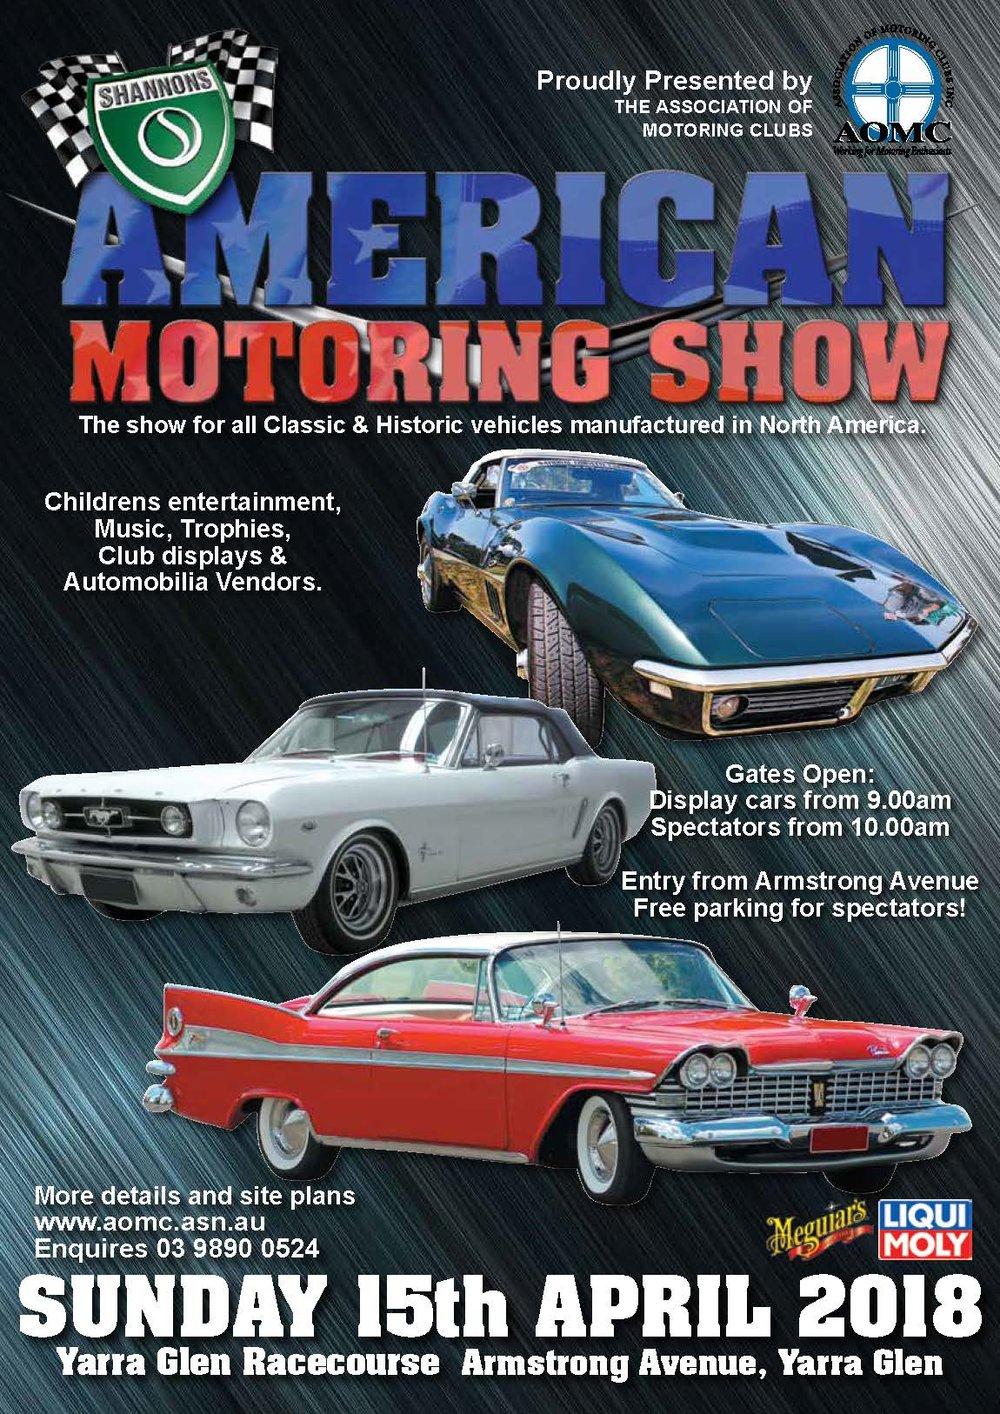 American Motor show Flyer 2018_v2.jpg